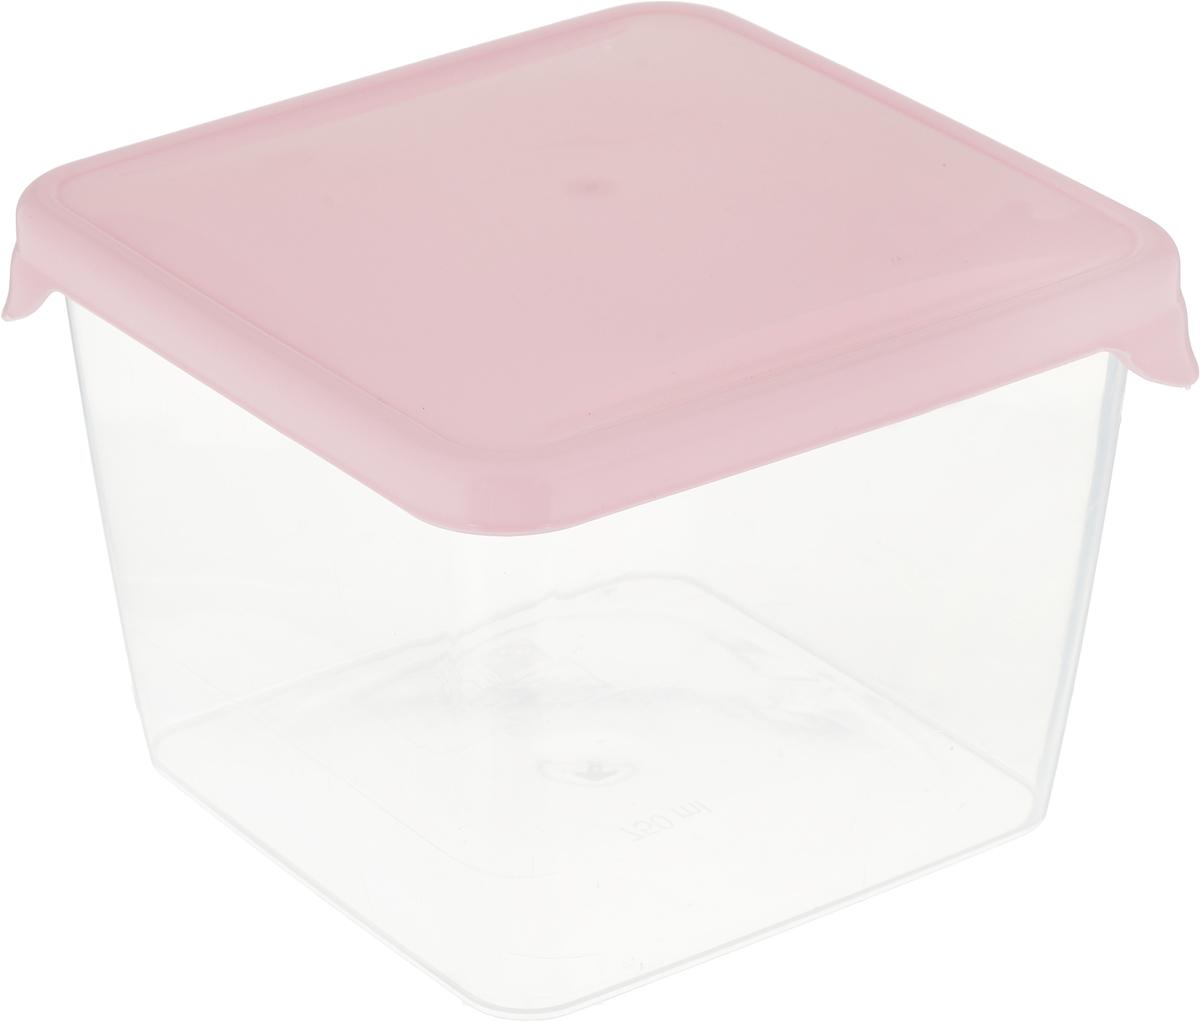 Емкость для продуктов Giaretti Браво, цвет: прозрачный, розовый, 750 мл емкость для продуктов giaretti браво цвет белый прозрачный 900 мл gr1068